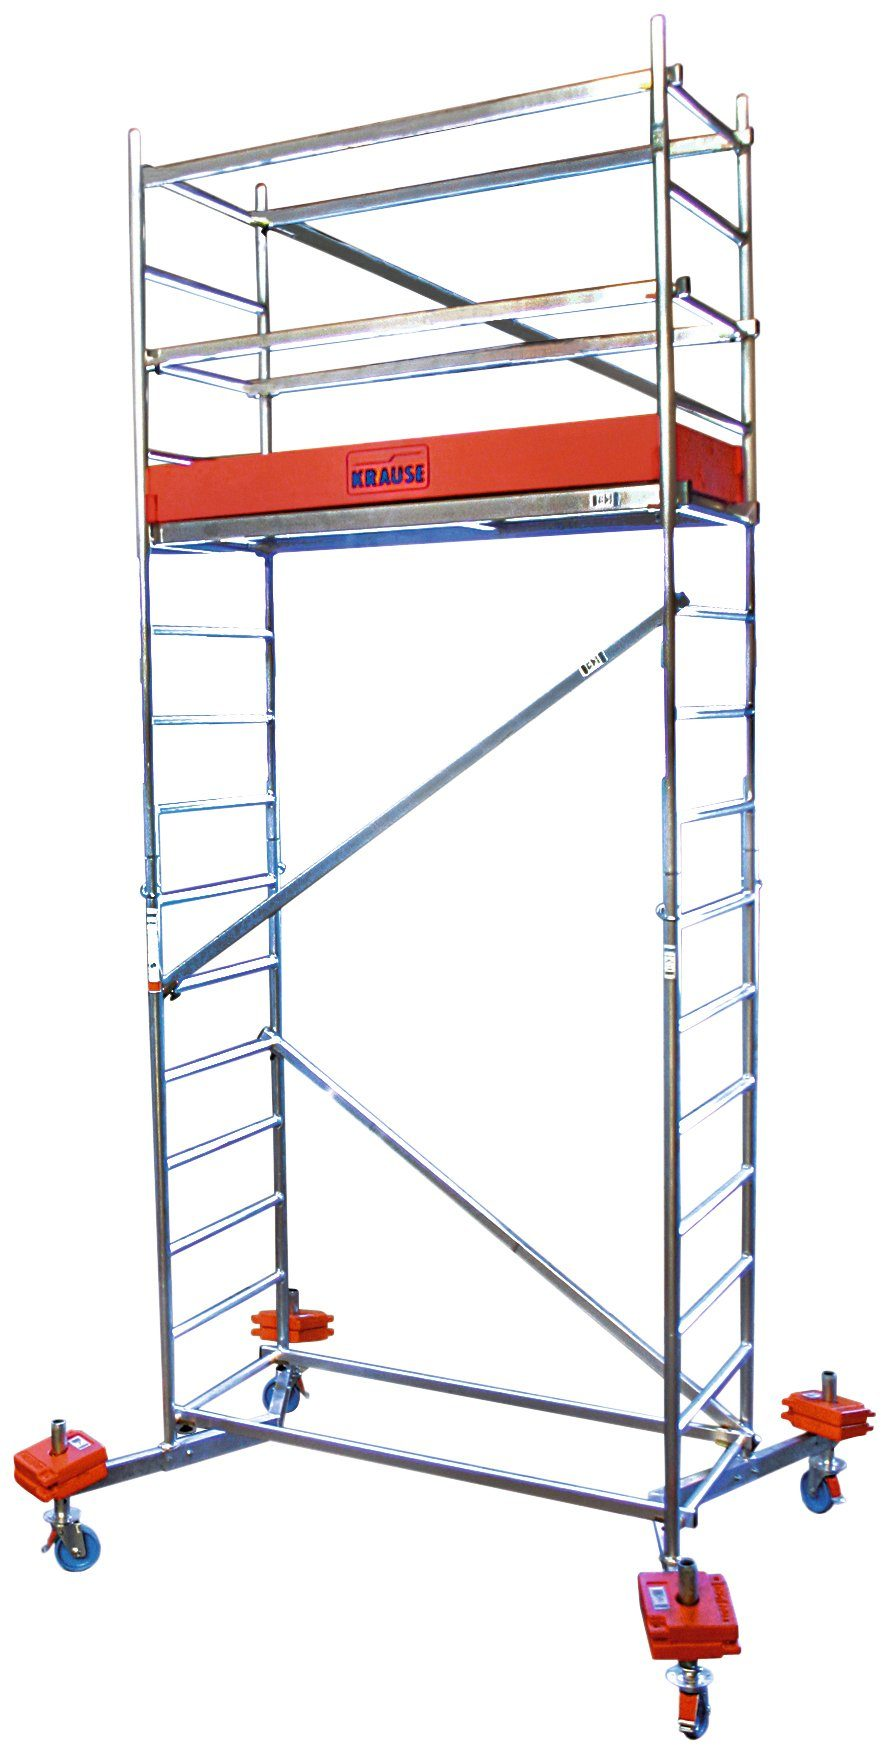 KRAUSE Fahrgerüst »ClimTec«, Arbeitshöhe 5m, inkl. Fahrrollensatz Ø 150 mm